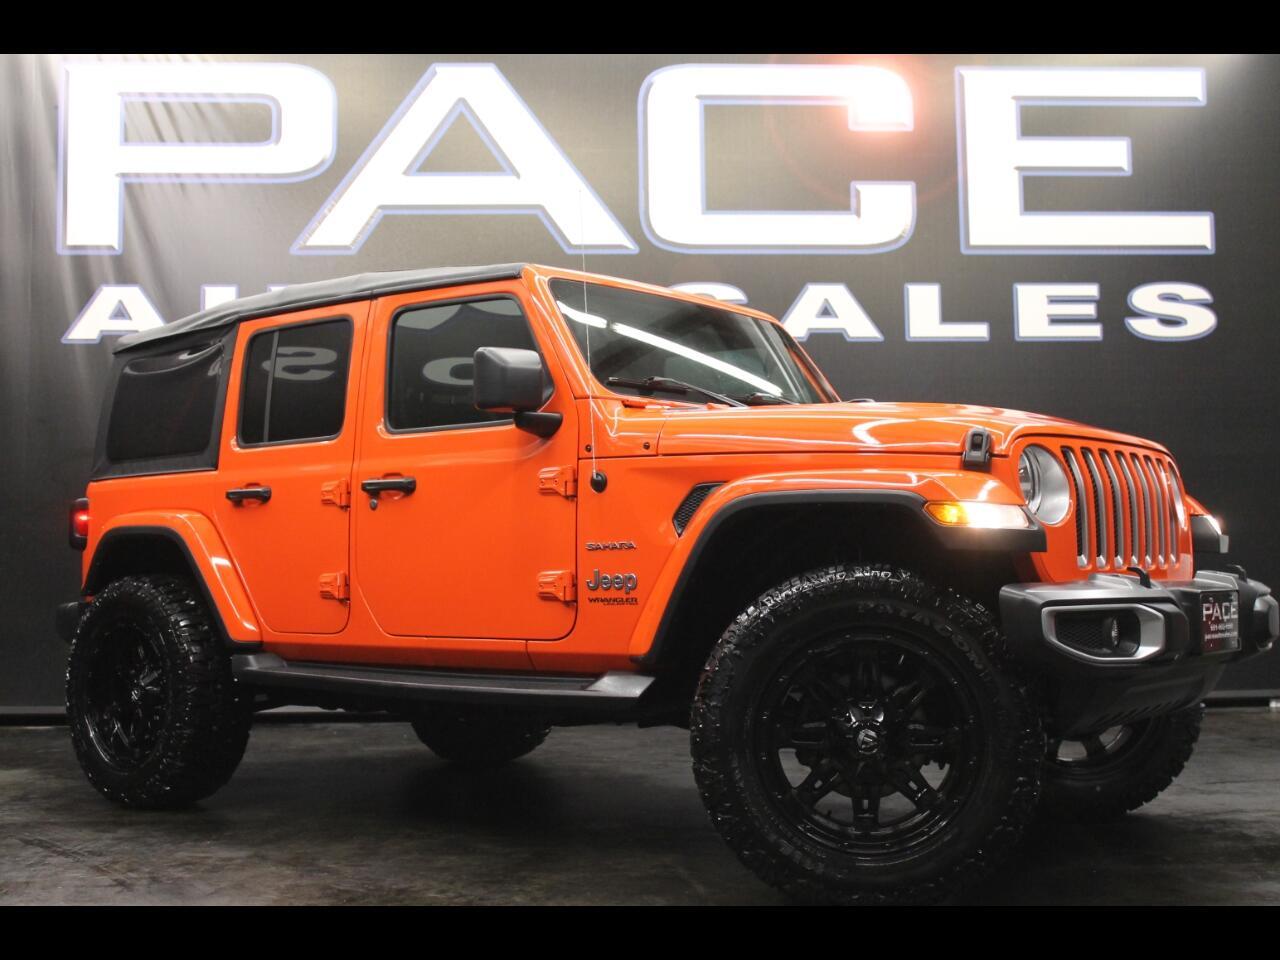 2018 Jeep Wrangler Unlimited Sahara 4x4 Unlimited Lifted Custom